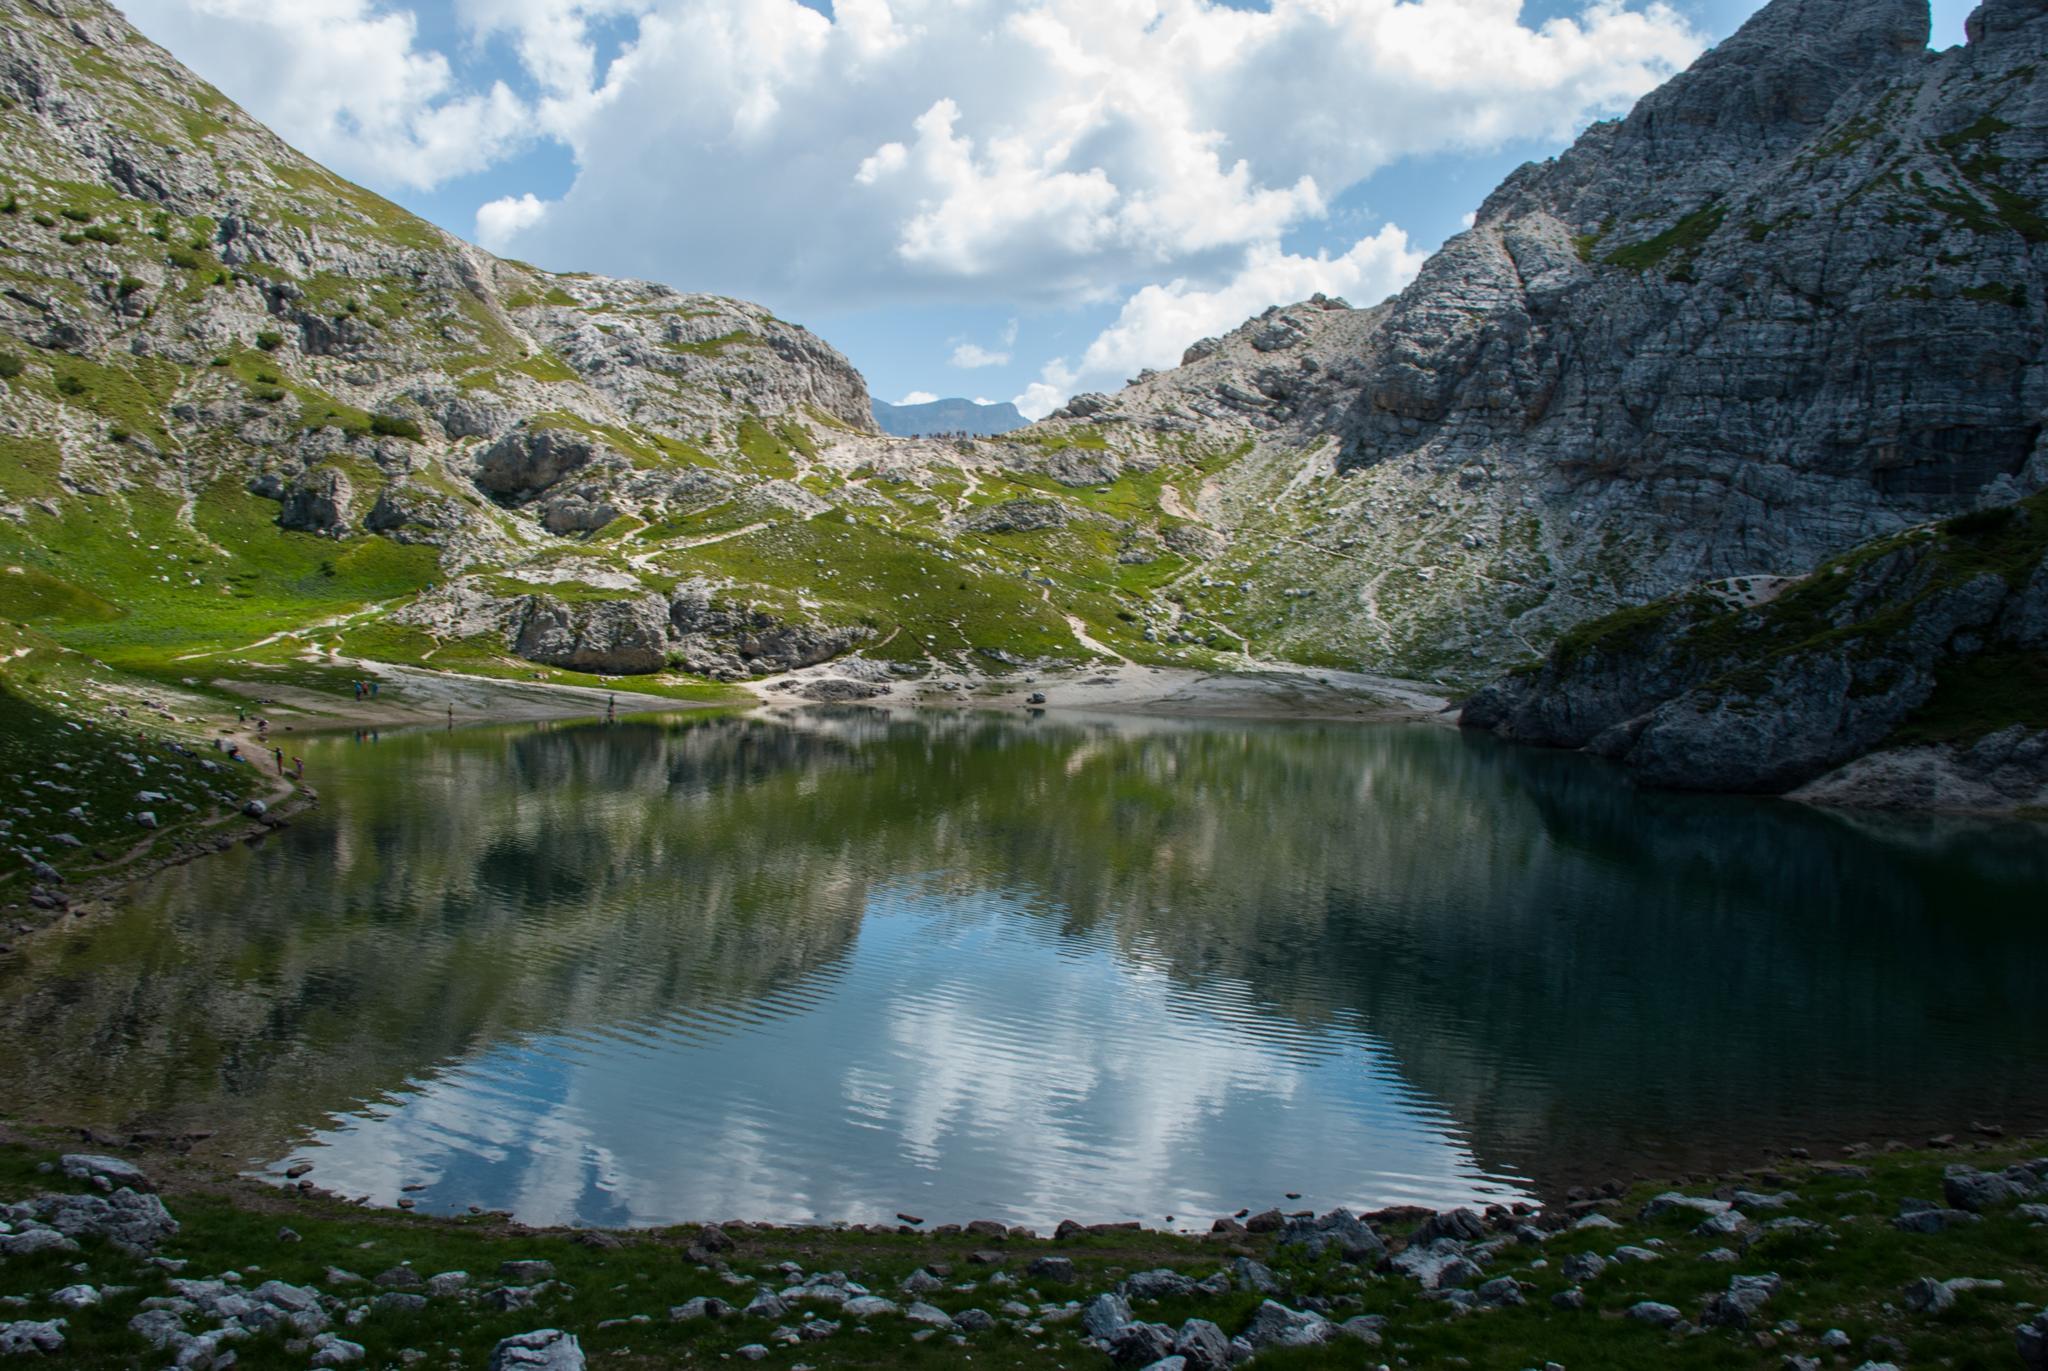 Lago Coldai by Matteo Gasparin